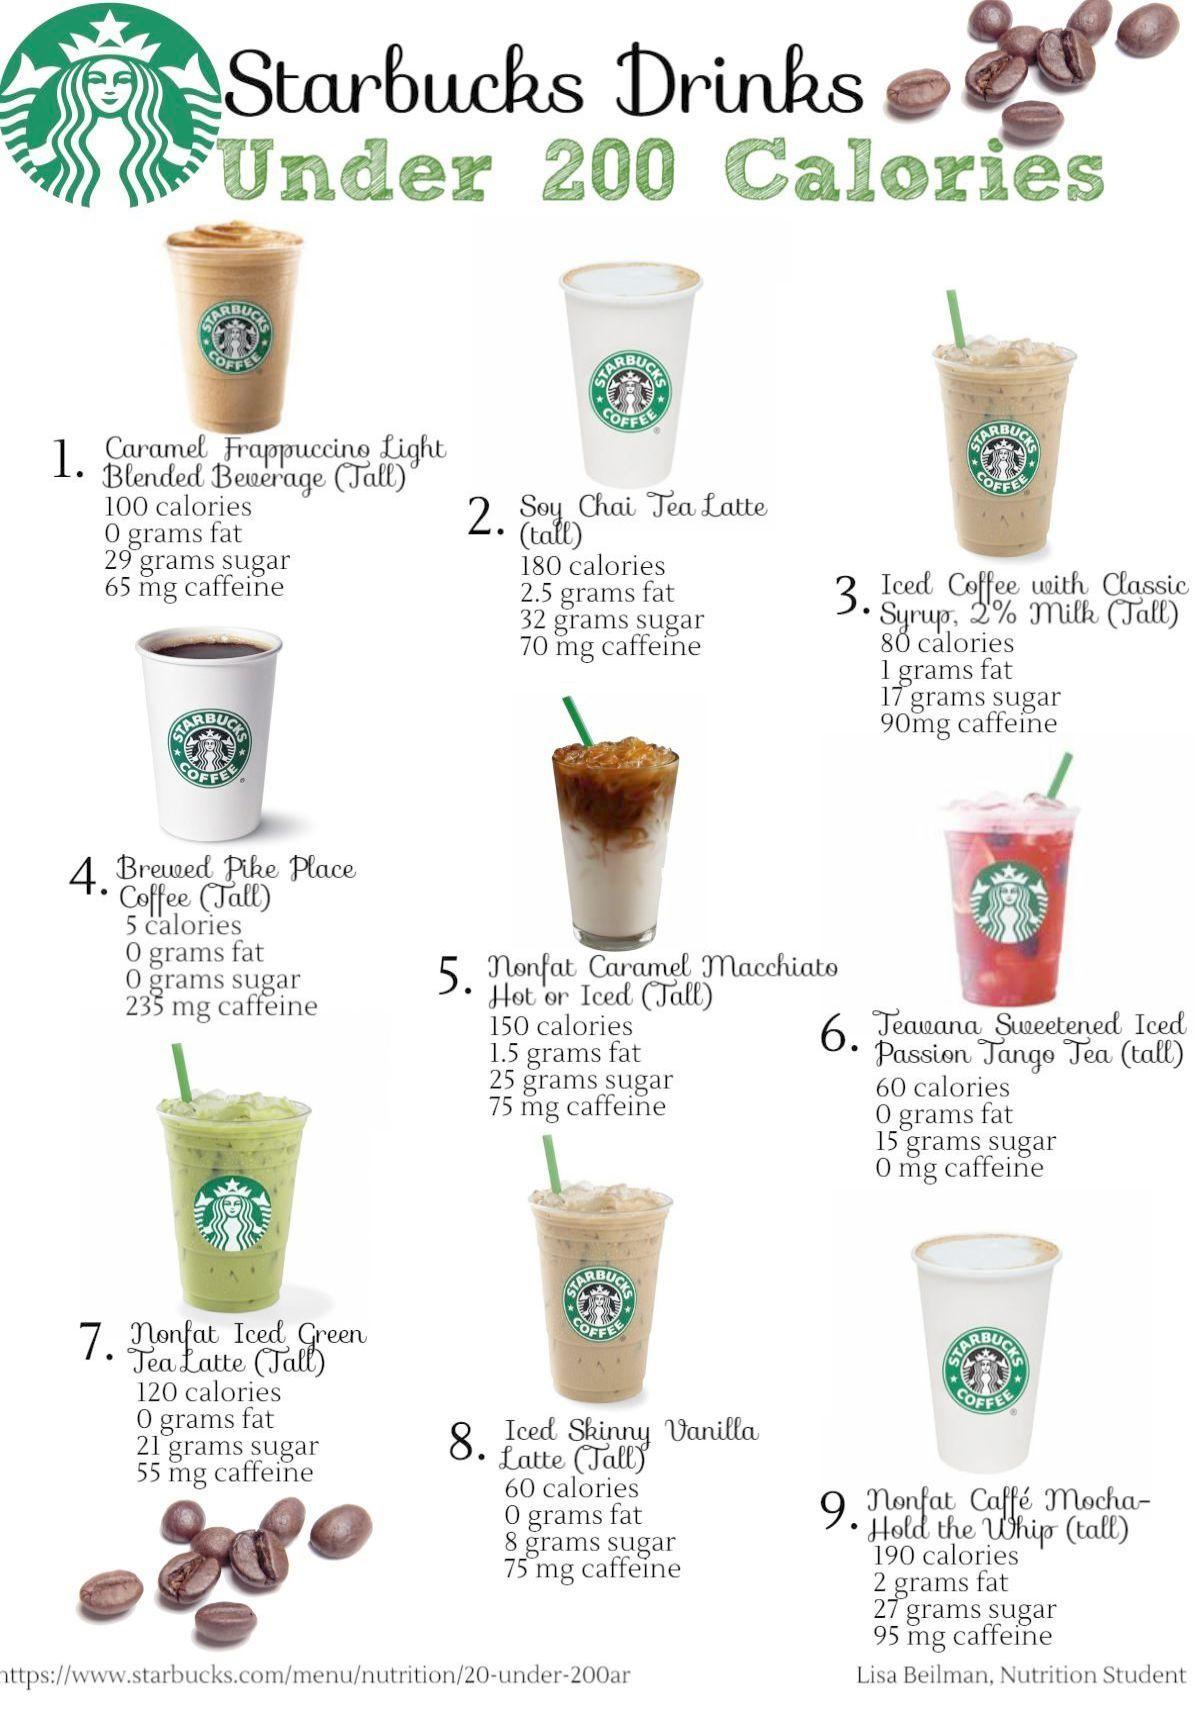 Coffee Meets Bagel Tinder All Coffee Shop Bar Not Coffee Rani Healthy Starbucks Starbucks Drinks Recipes Starbucks Drinks